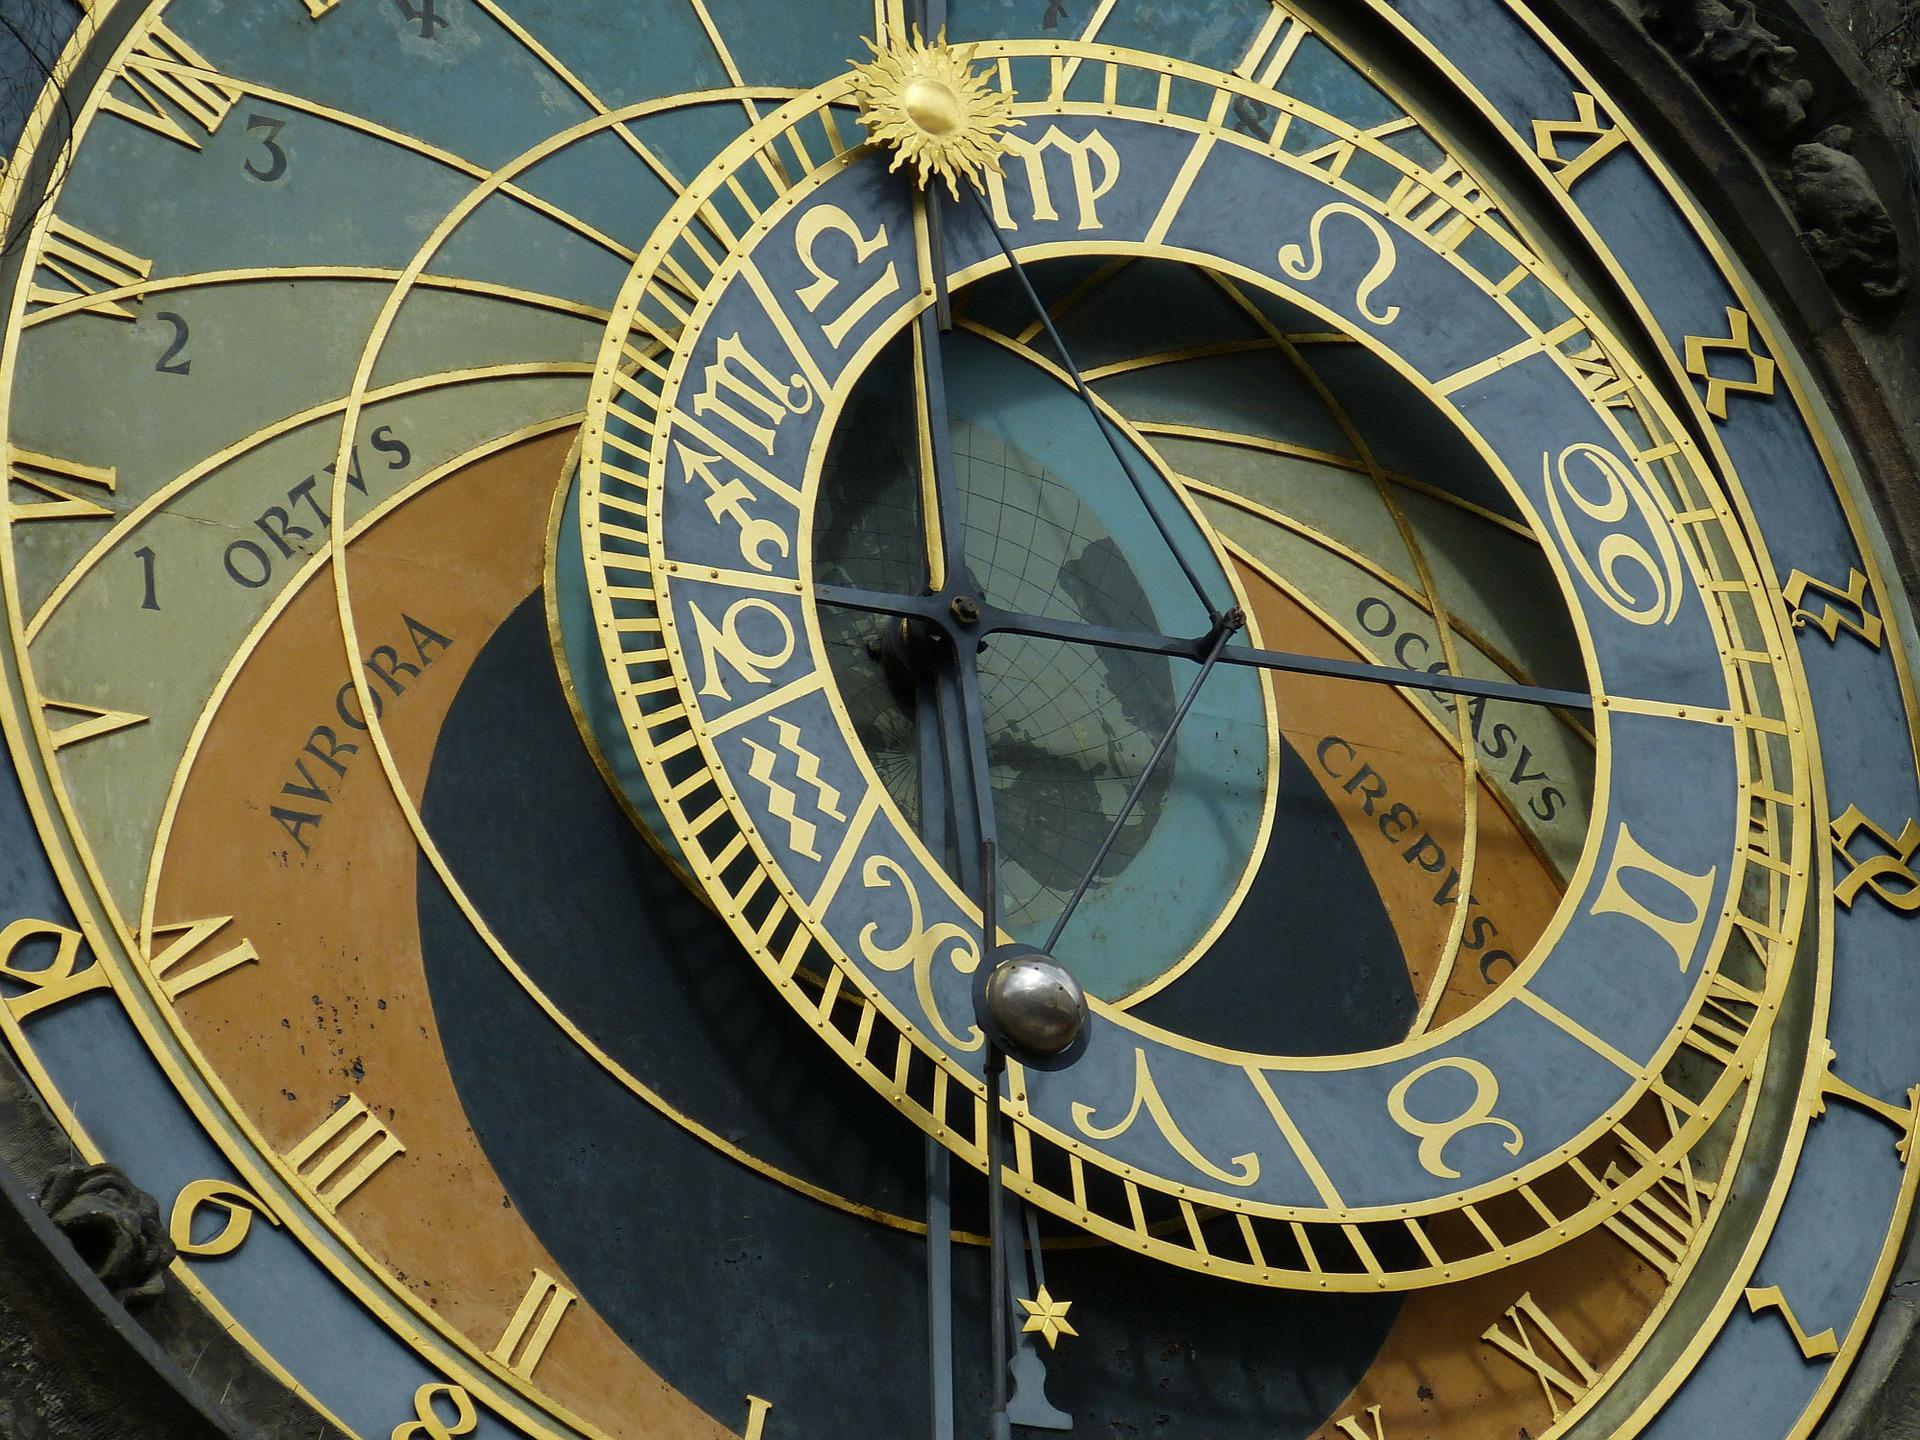 astronomical-clock-226897_1920.jpg